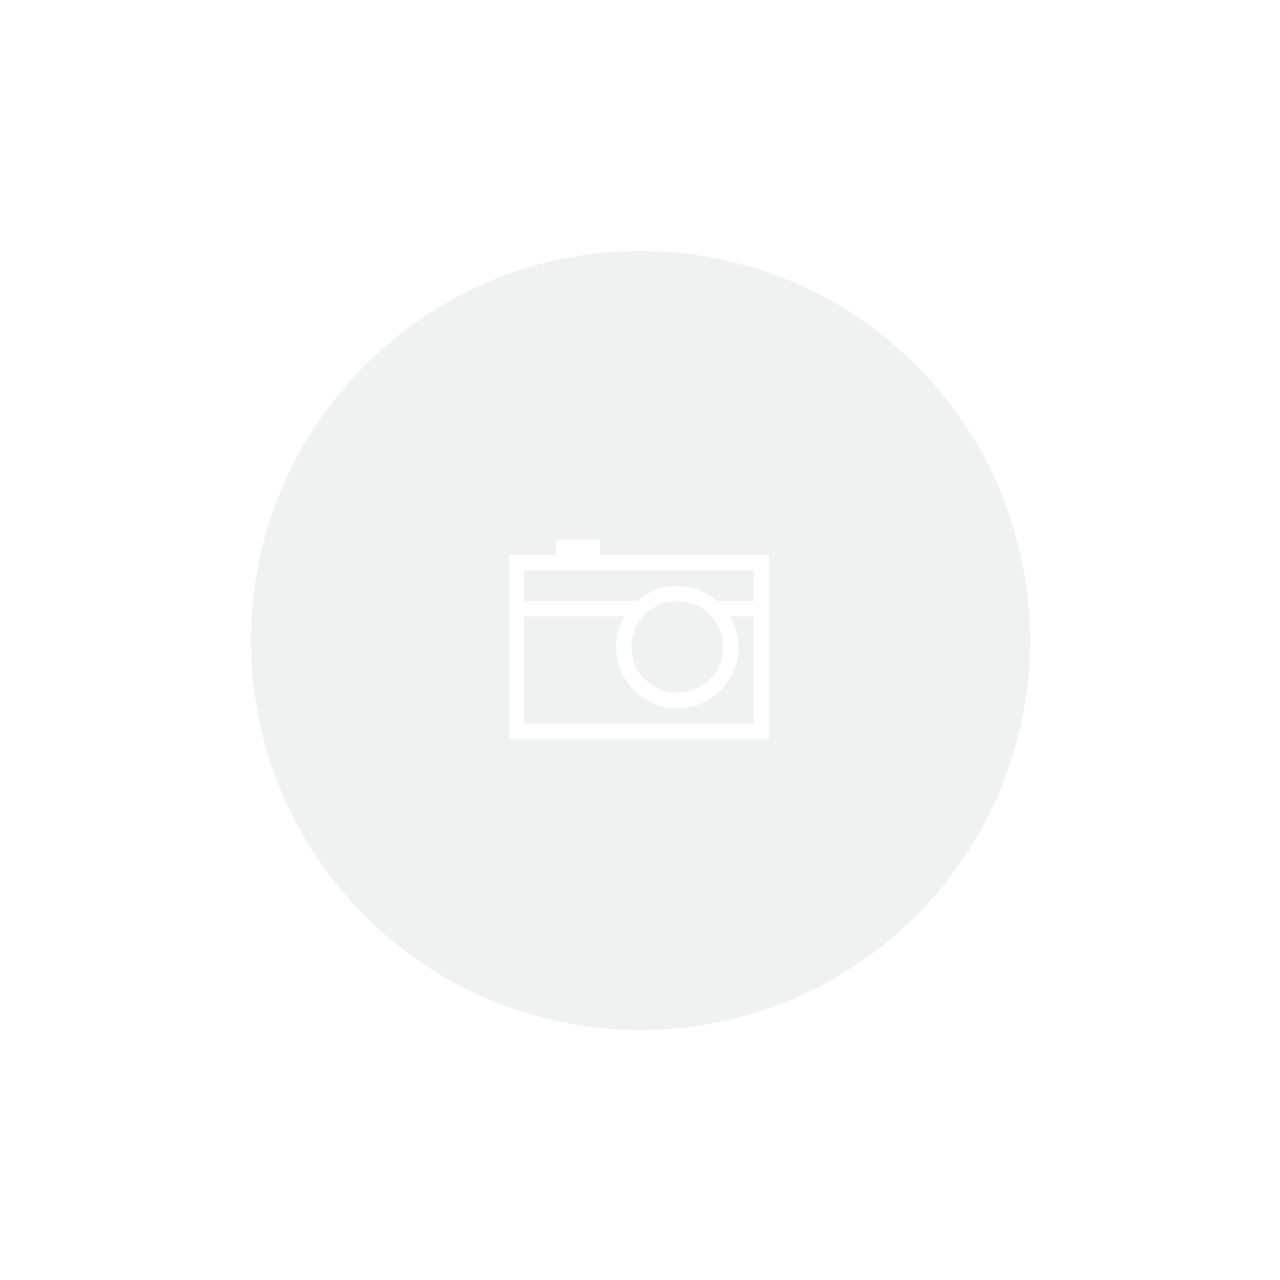 PLACA DE VIDEO SAPPHIRE NITRO+ RADEON RX 570 4GB GDDR5,11266-14-20G